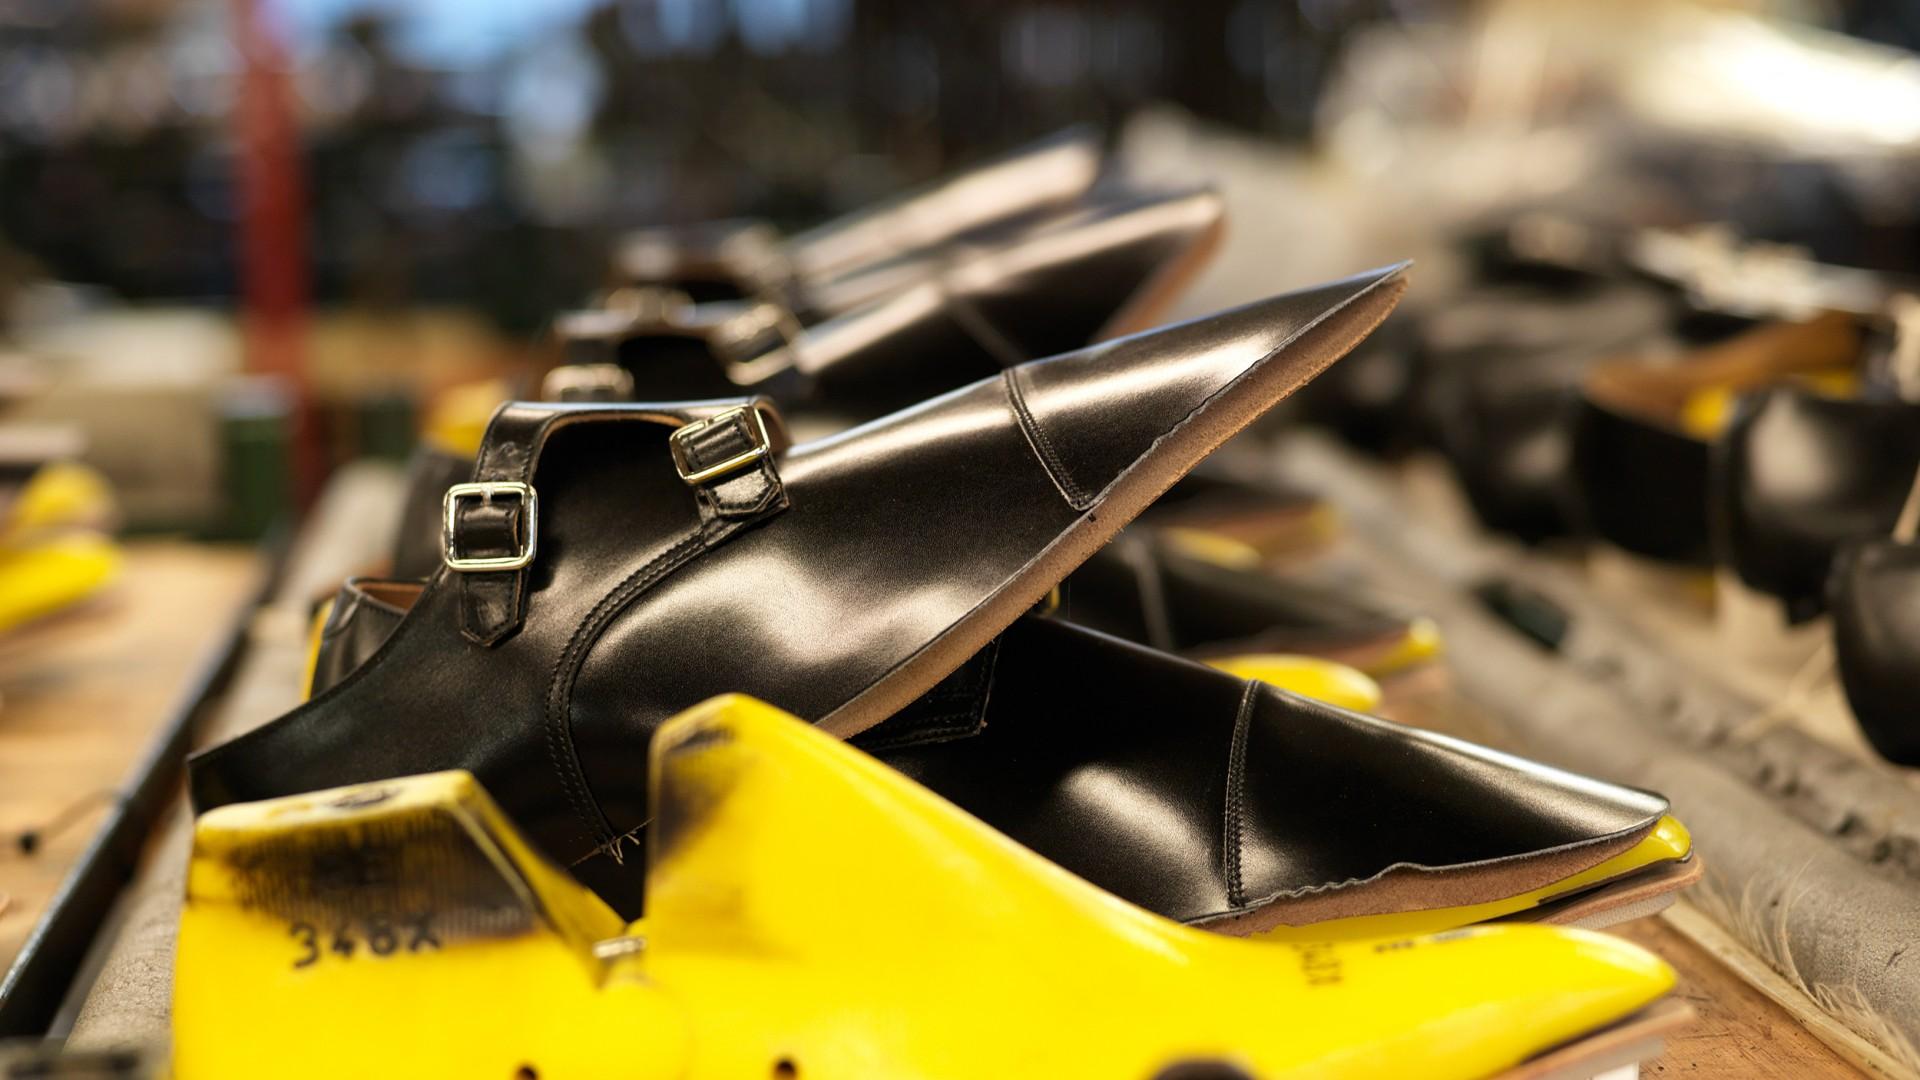 How Crockett Jones Make Its Shoes Square Mile Cut Engineer Crocodile Safety Steel Genuine Leather Brown Preparation